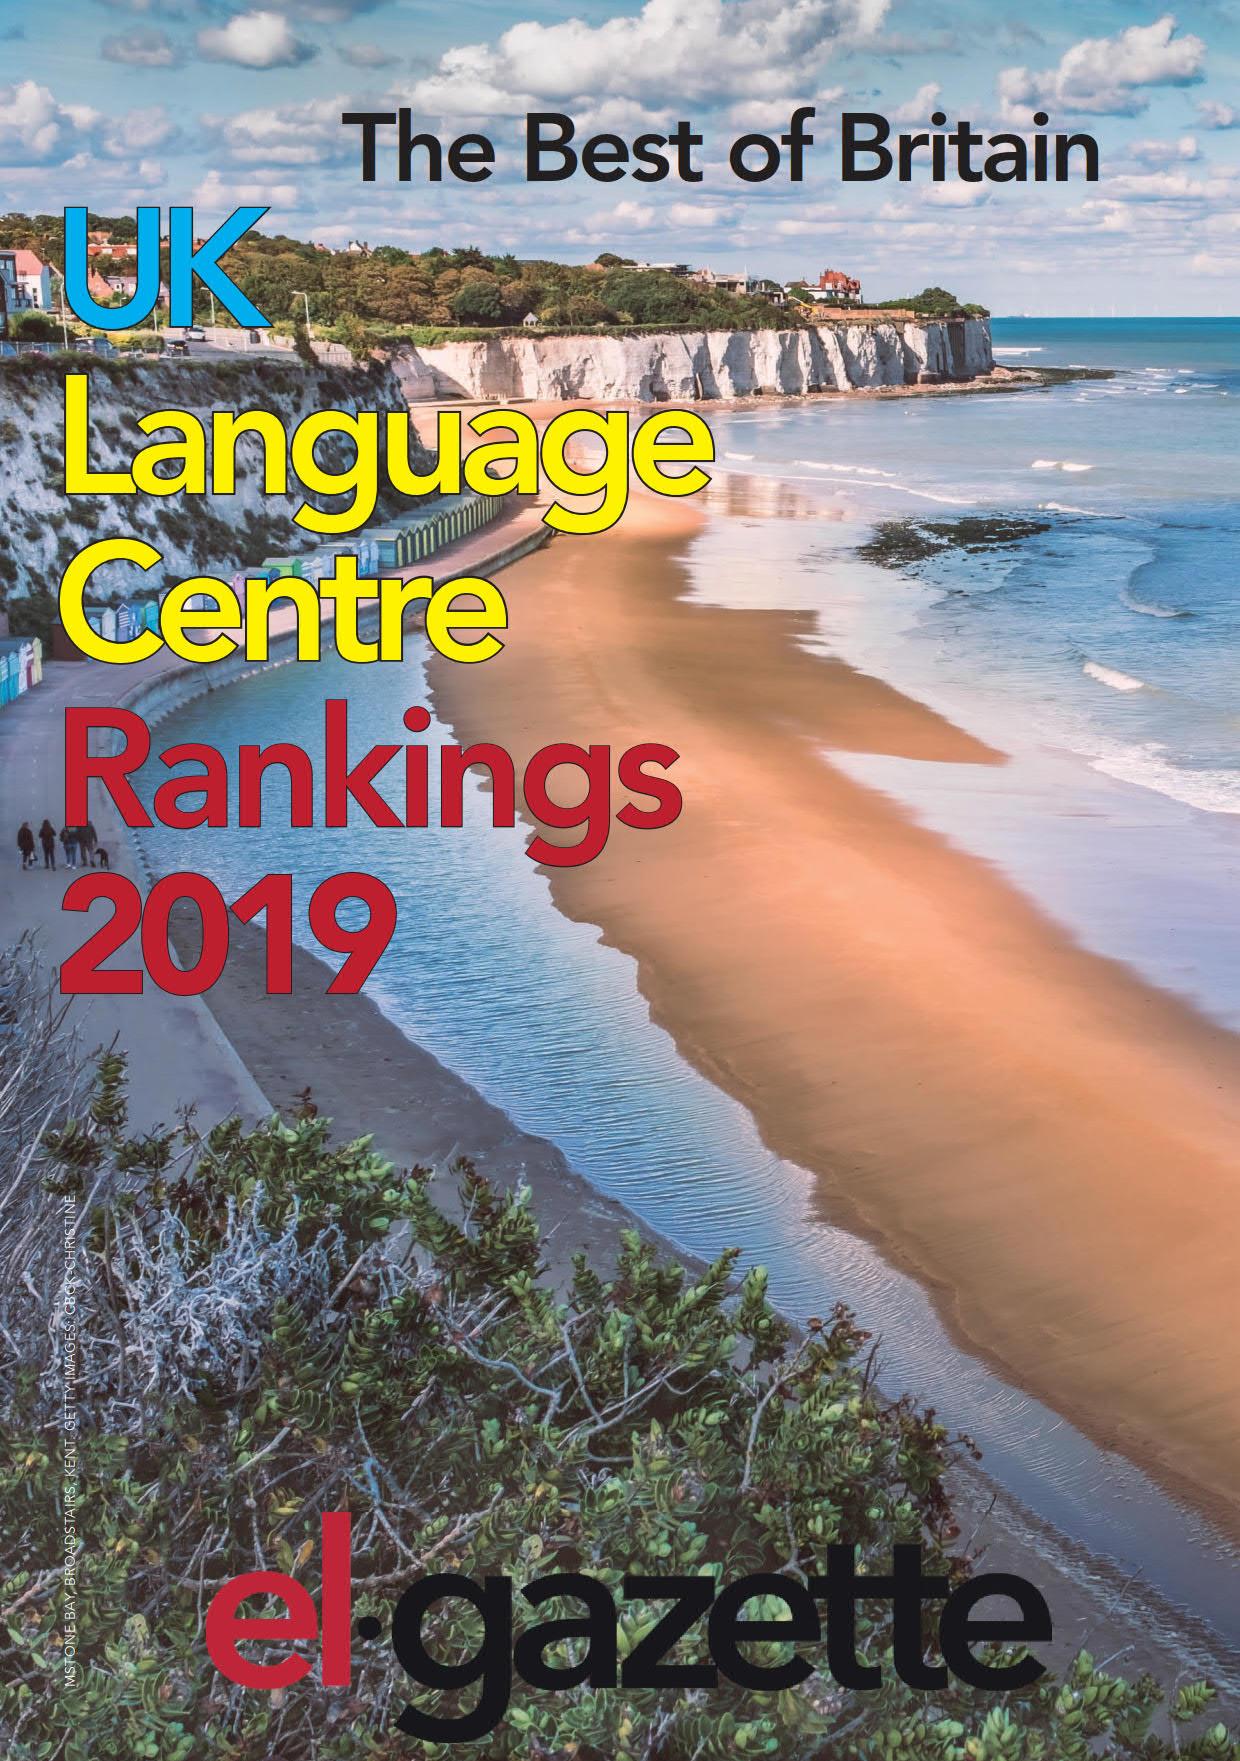 UK Language Centre Rankings 2019